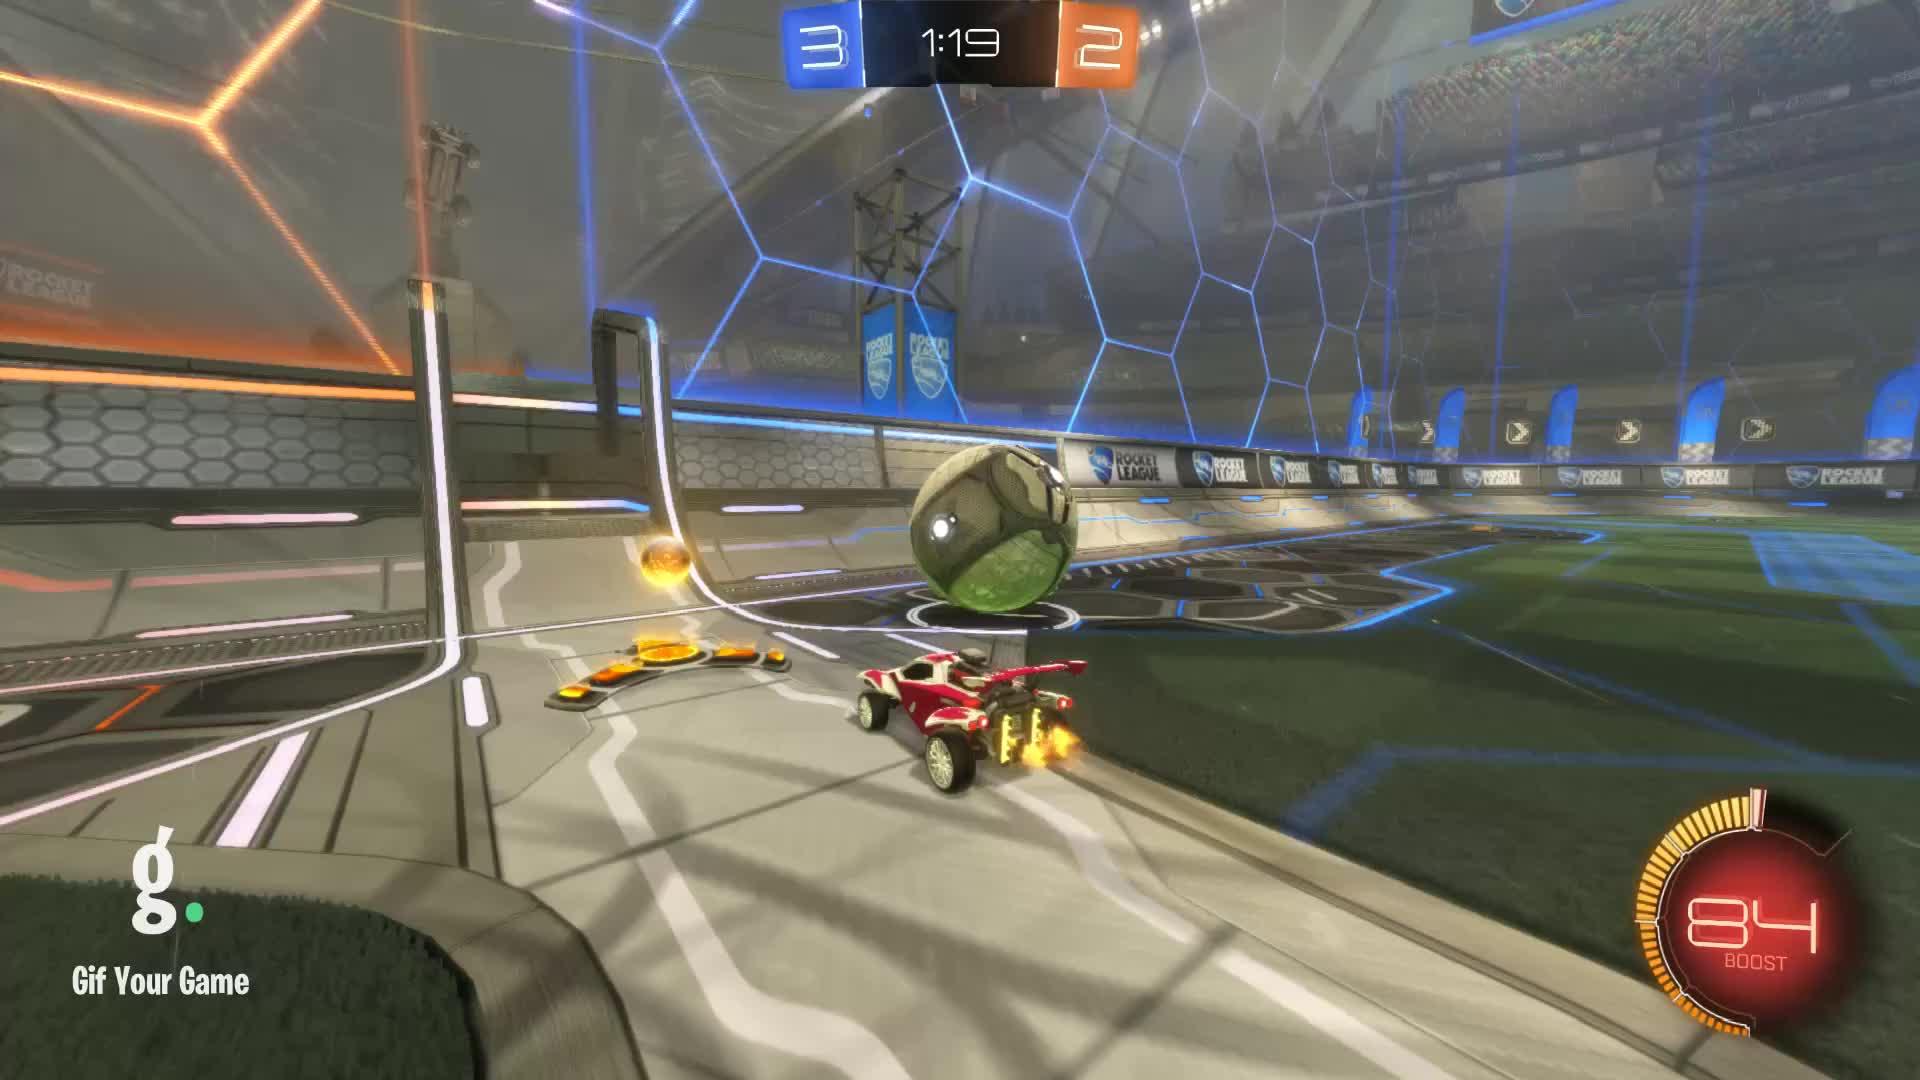 DiamondDog., Gif Your Game, GifYourGame, Goal, Rocket League, RocketLeague, Goal 6: DiamondDog. GIFs